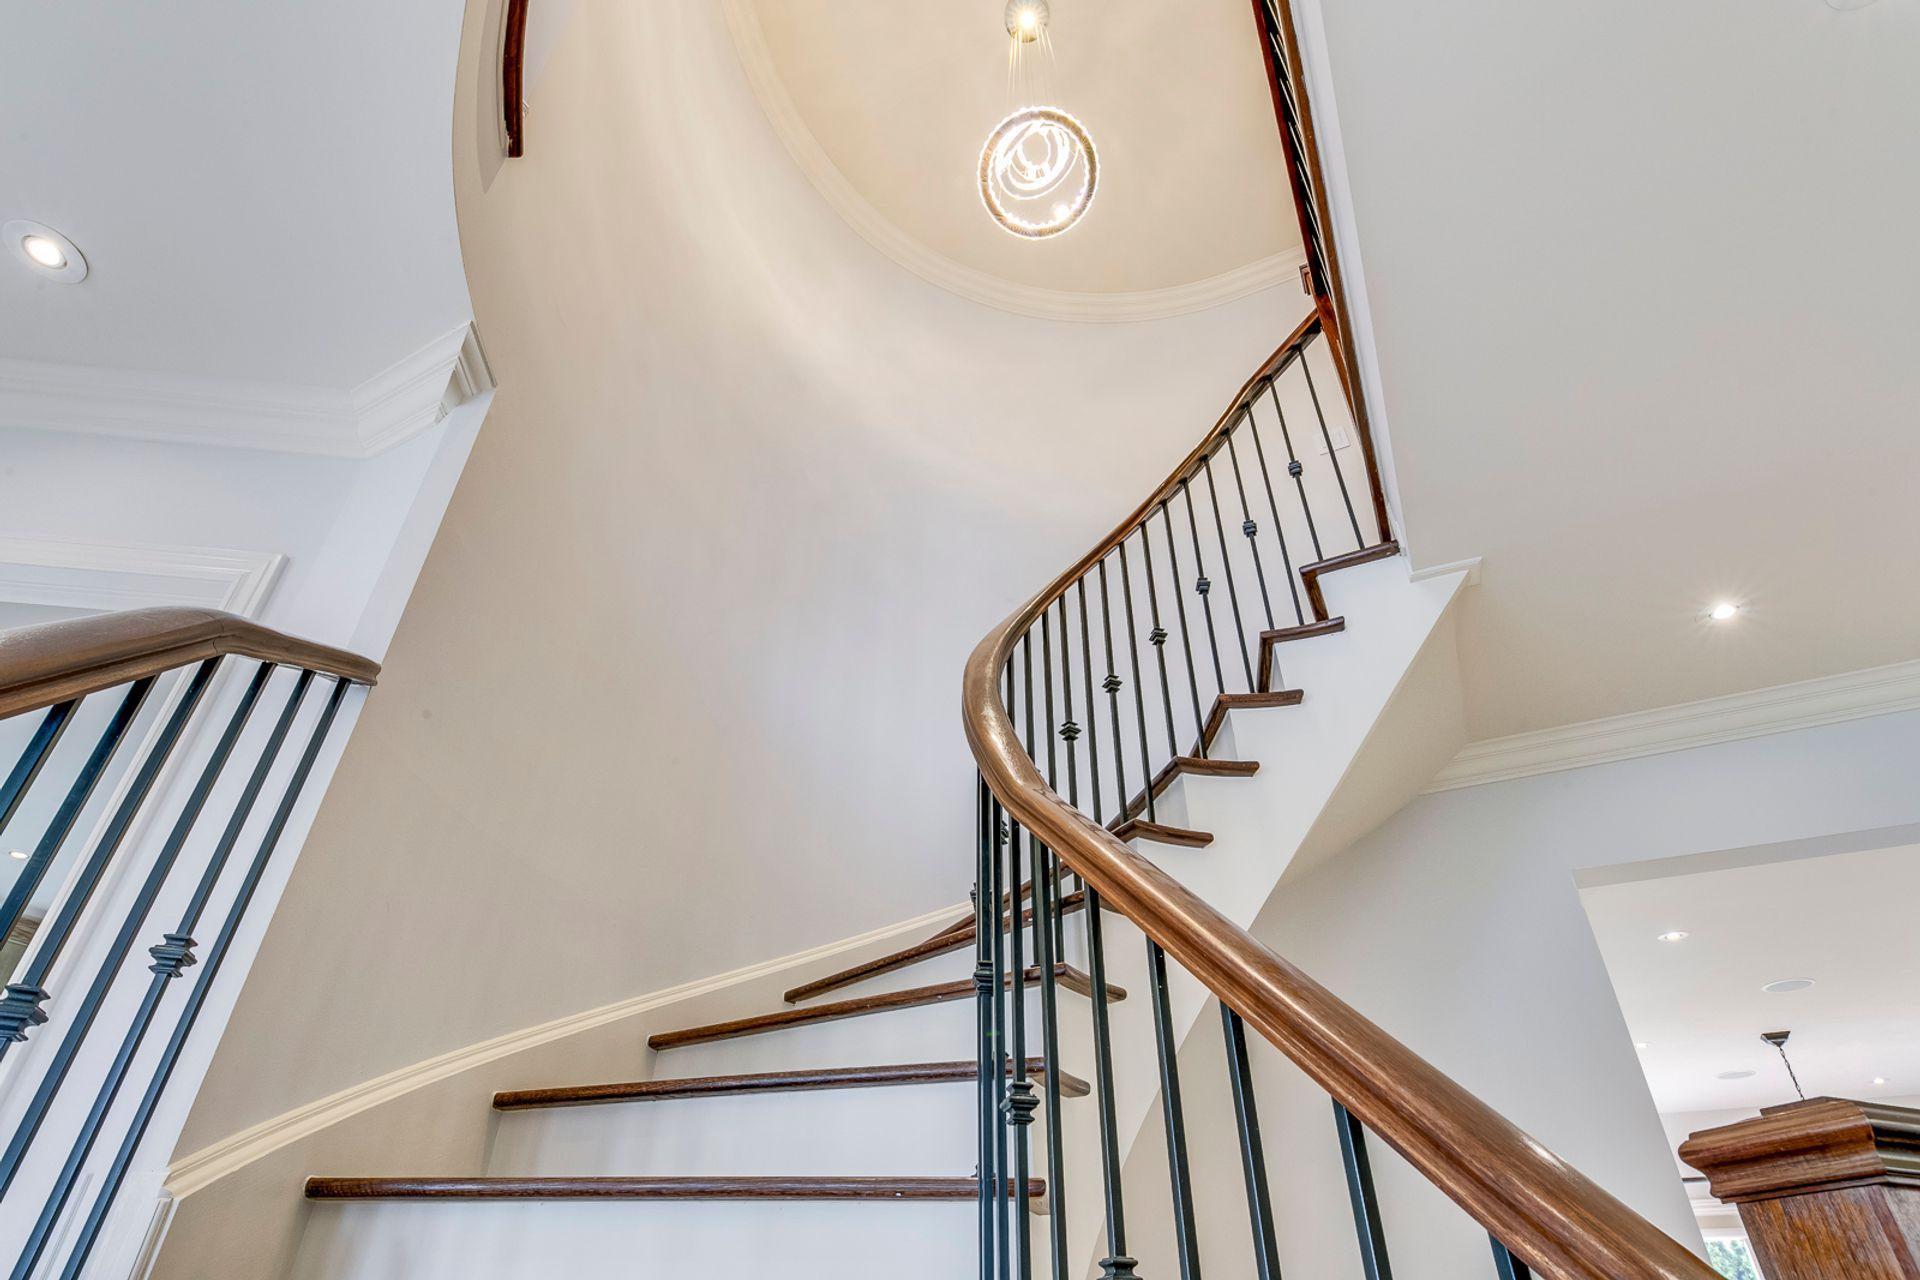 Stairs - 2487 Bon Echo Dr, Oakville - Elite3 & Team at 2487 Bon Echo Drive, Iroquois Ridge North, Oakville